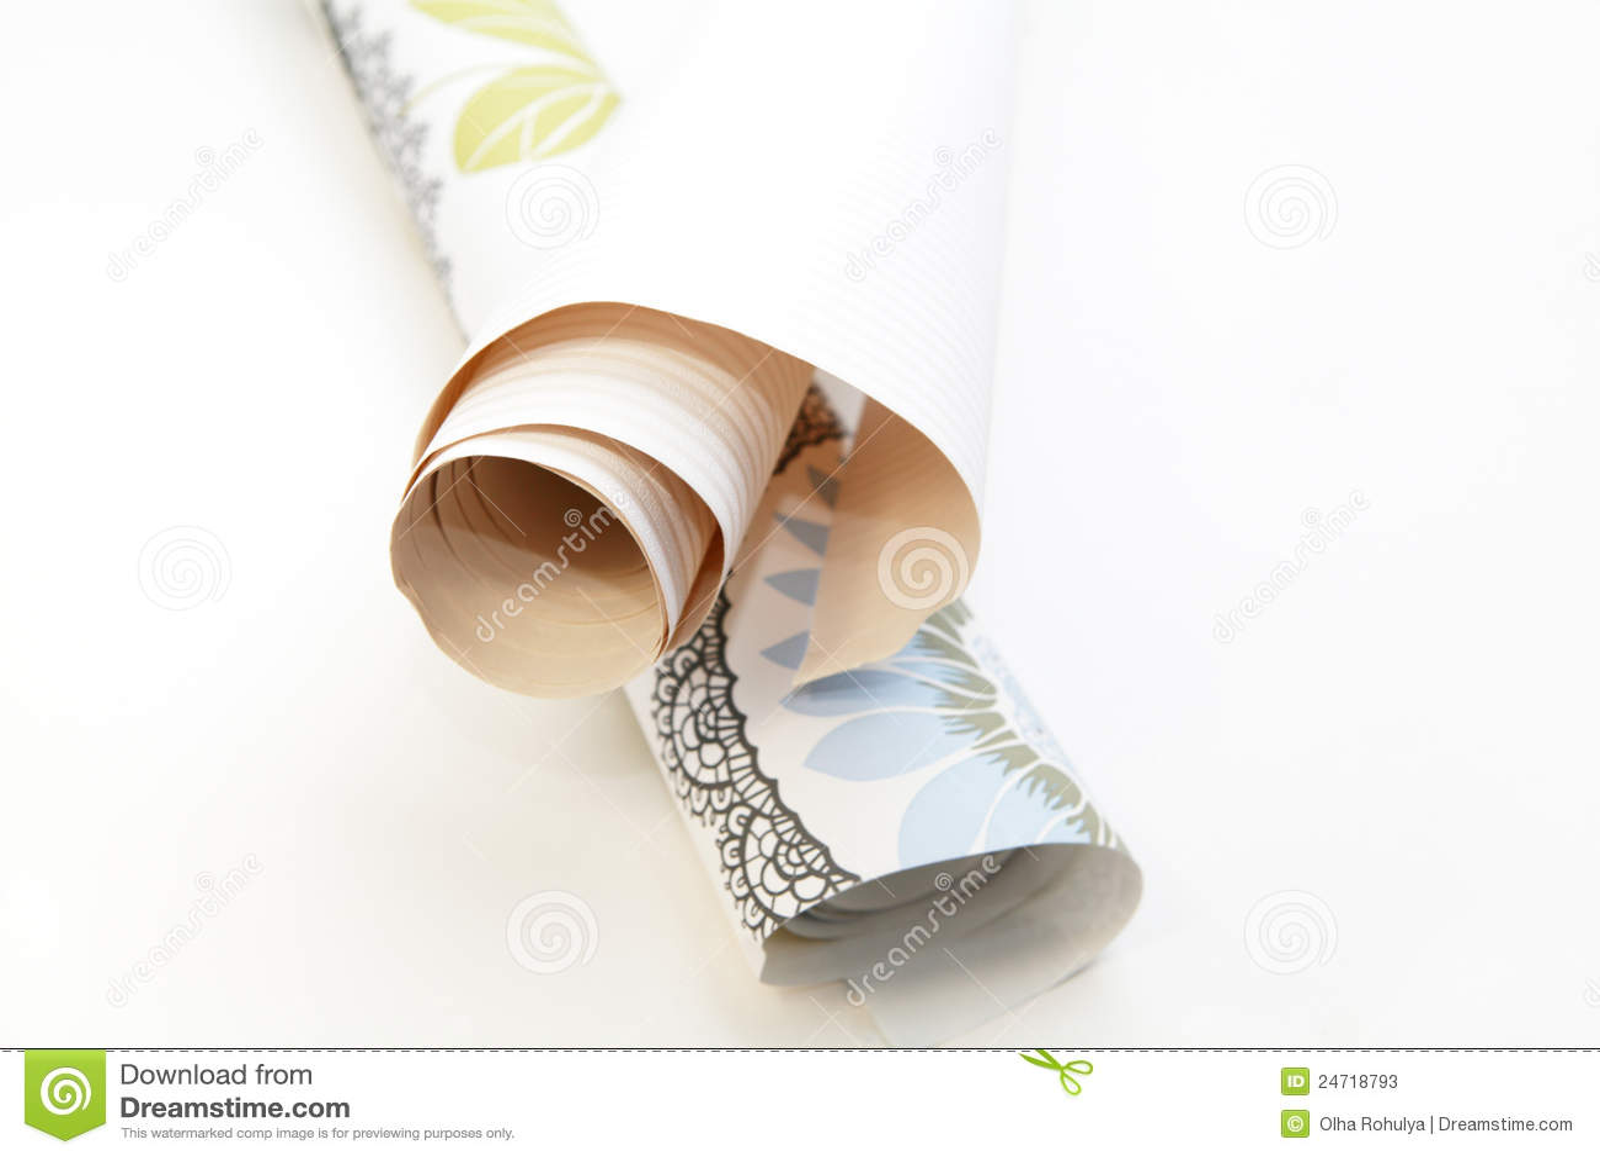 Two rolls of wallpaper